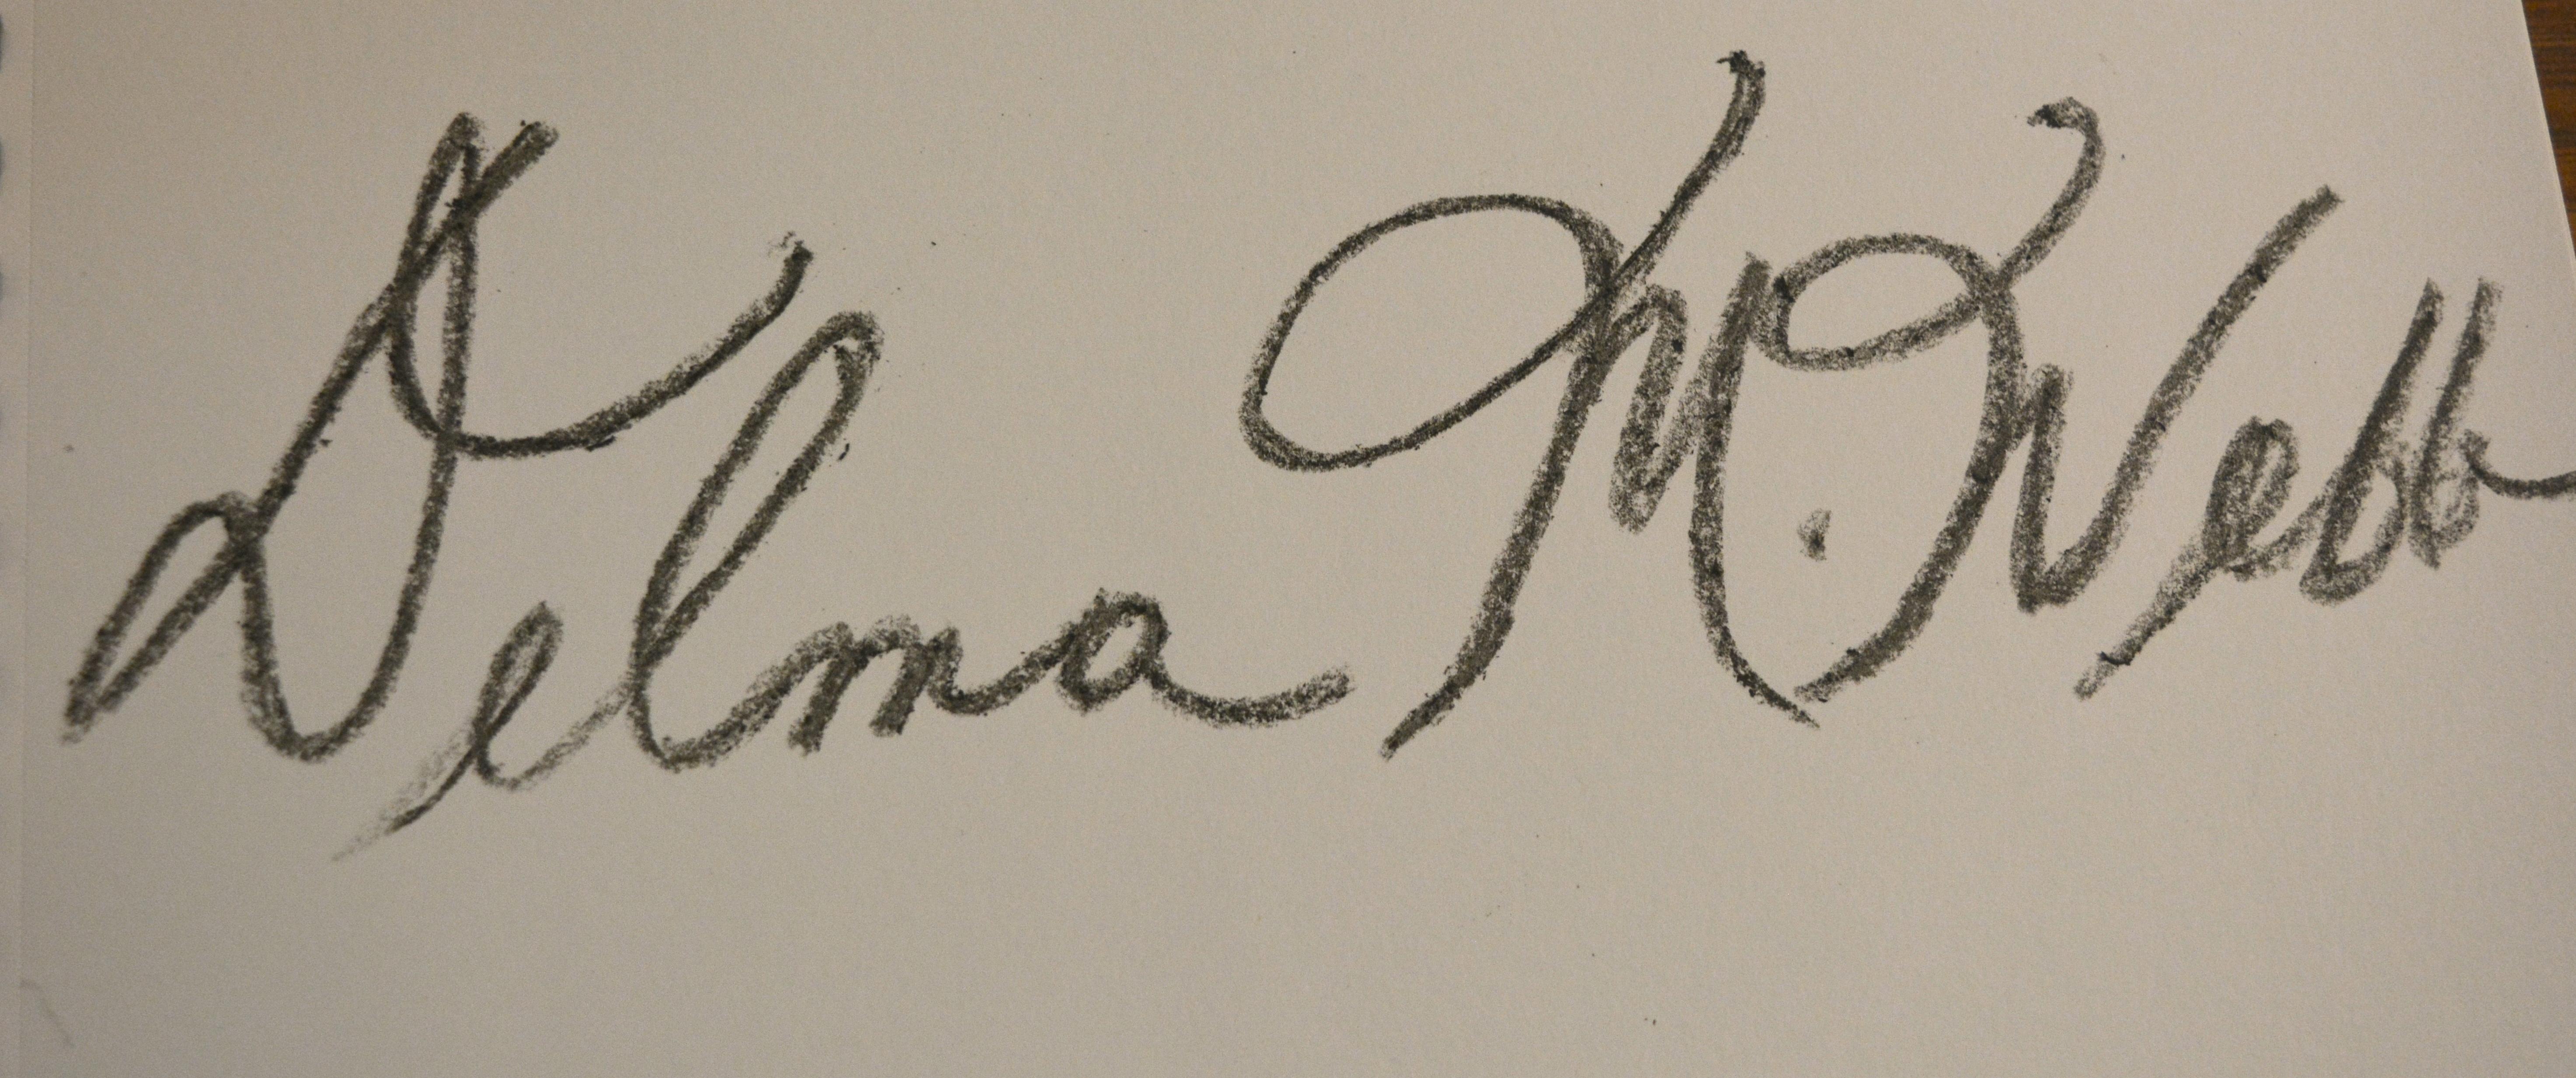 delmamwebb's Signature